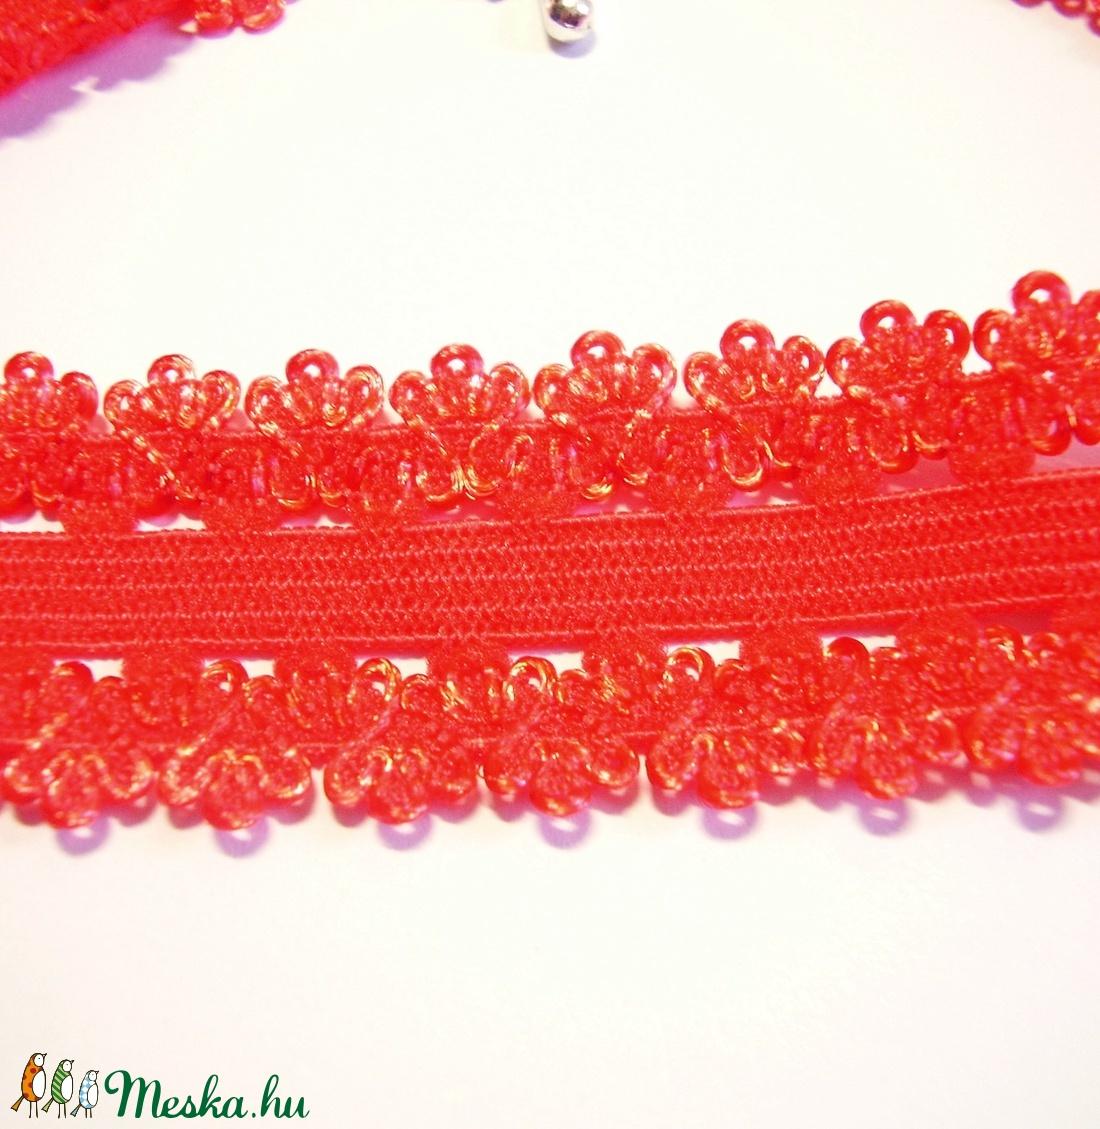 4b4f2c8c5 Piros elasztikus csipke choker, nyakpánt L-GO25 (gyongyvilag) - Meska.hu